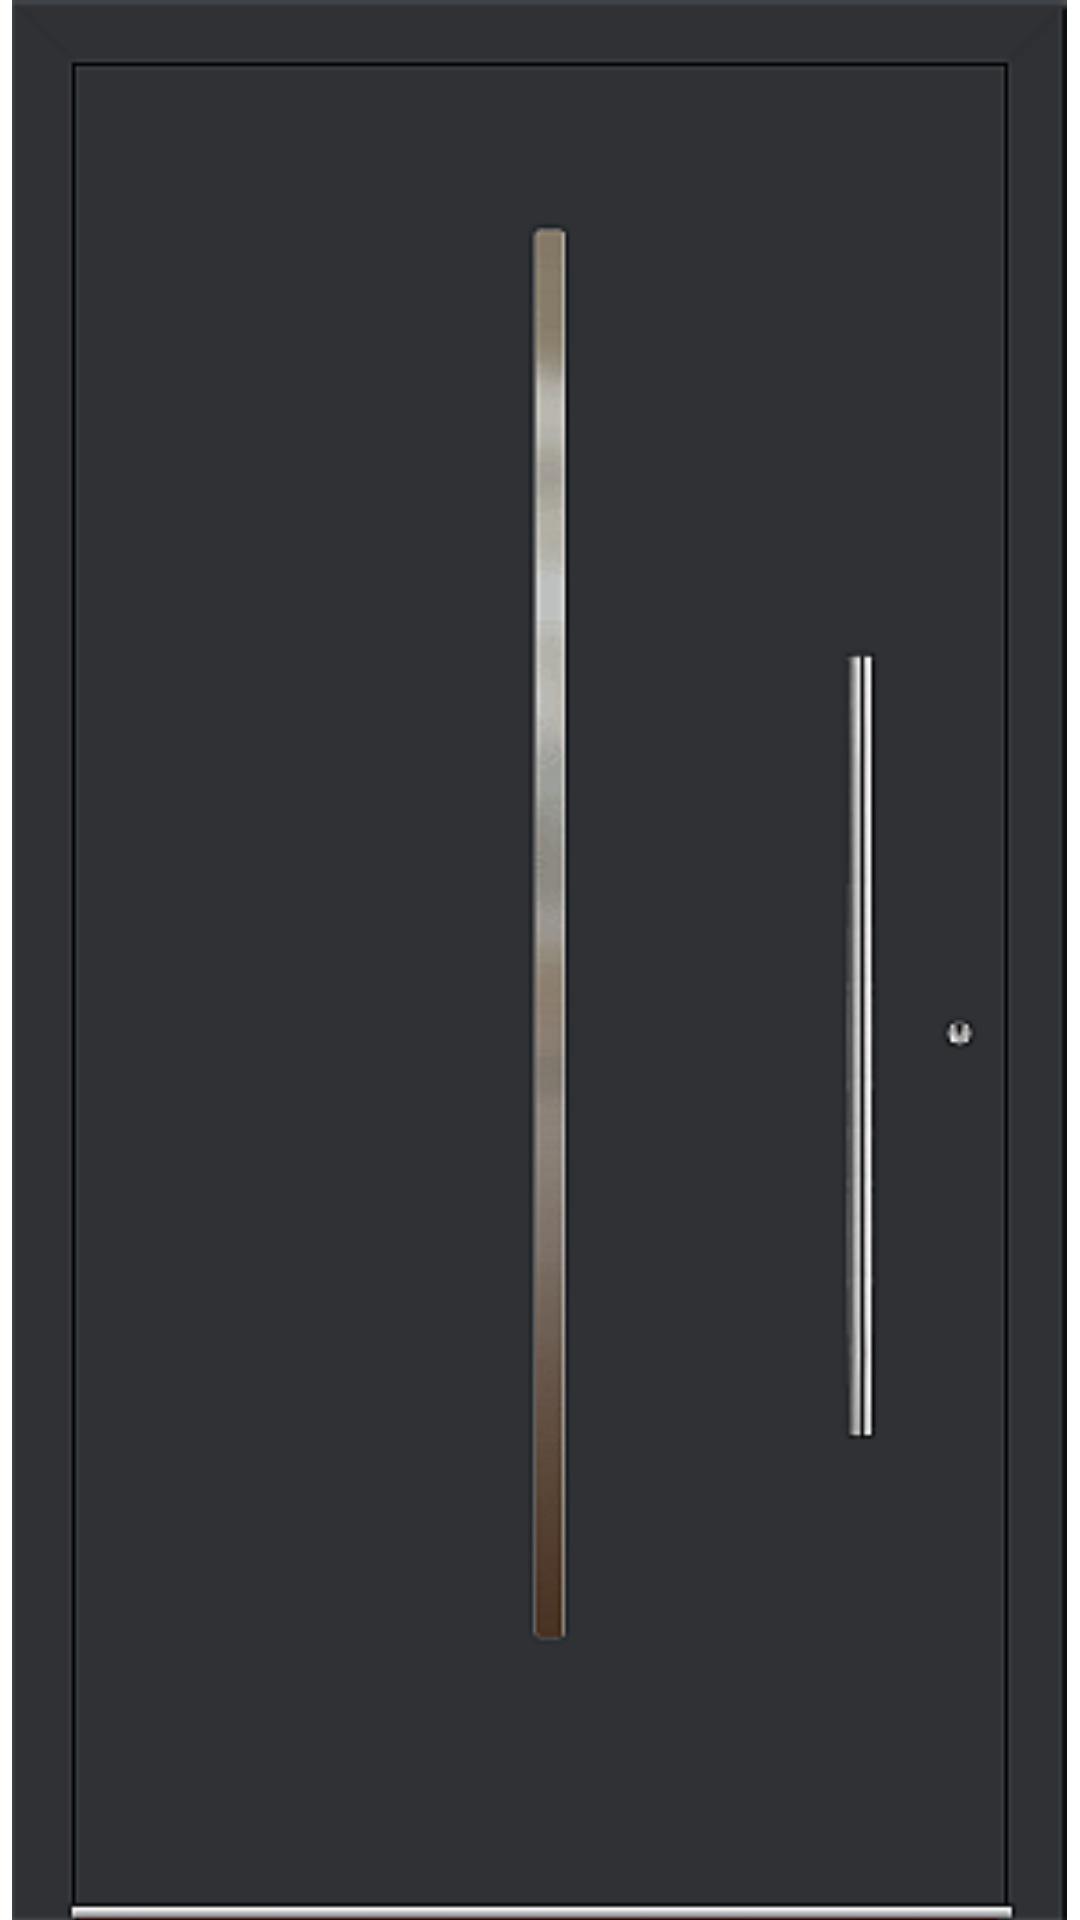 PaXentrée Aluminium Haustür M01101 schwarz